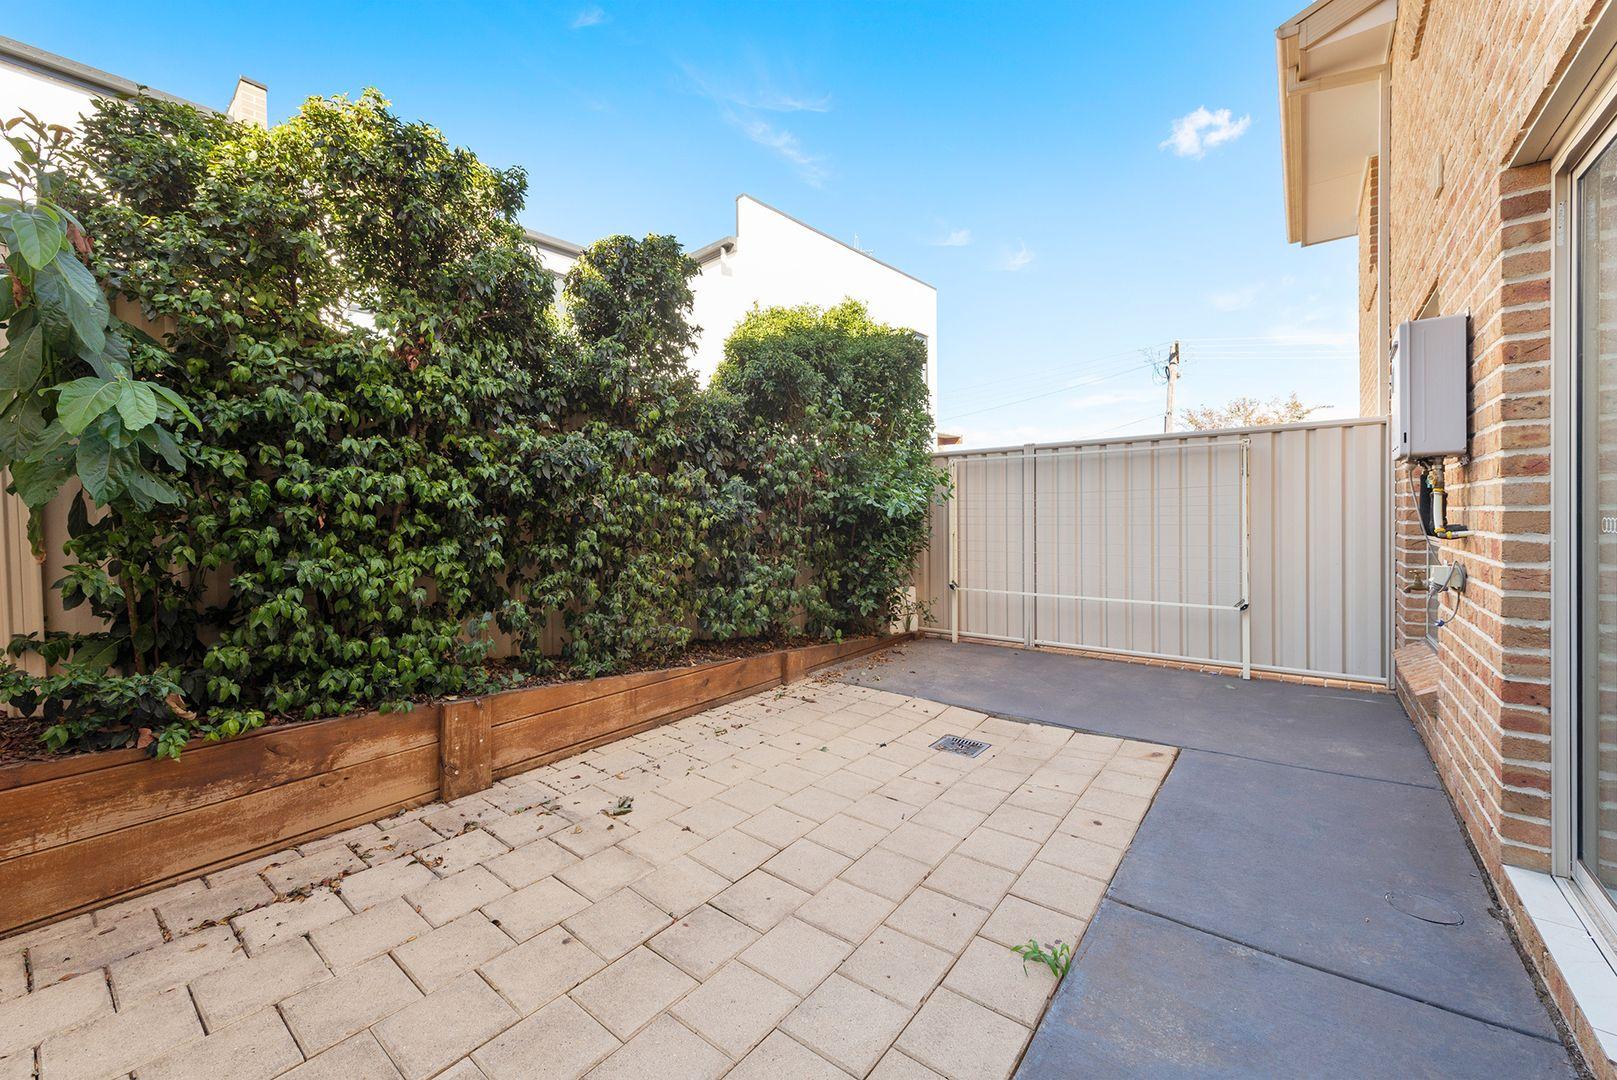 11 (H) 19/03/2019/7-9 Blackall Avenue, Crestwood NSW 2620, Image 2